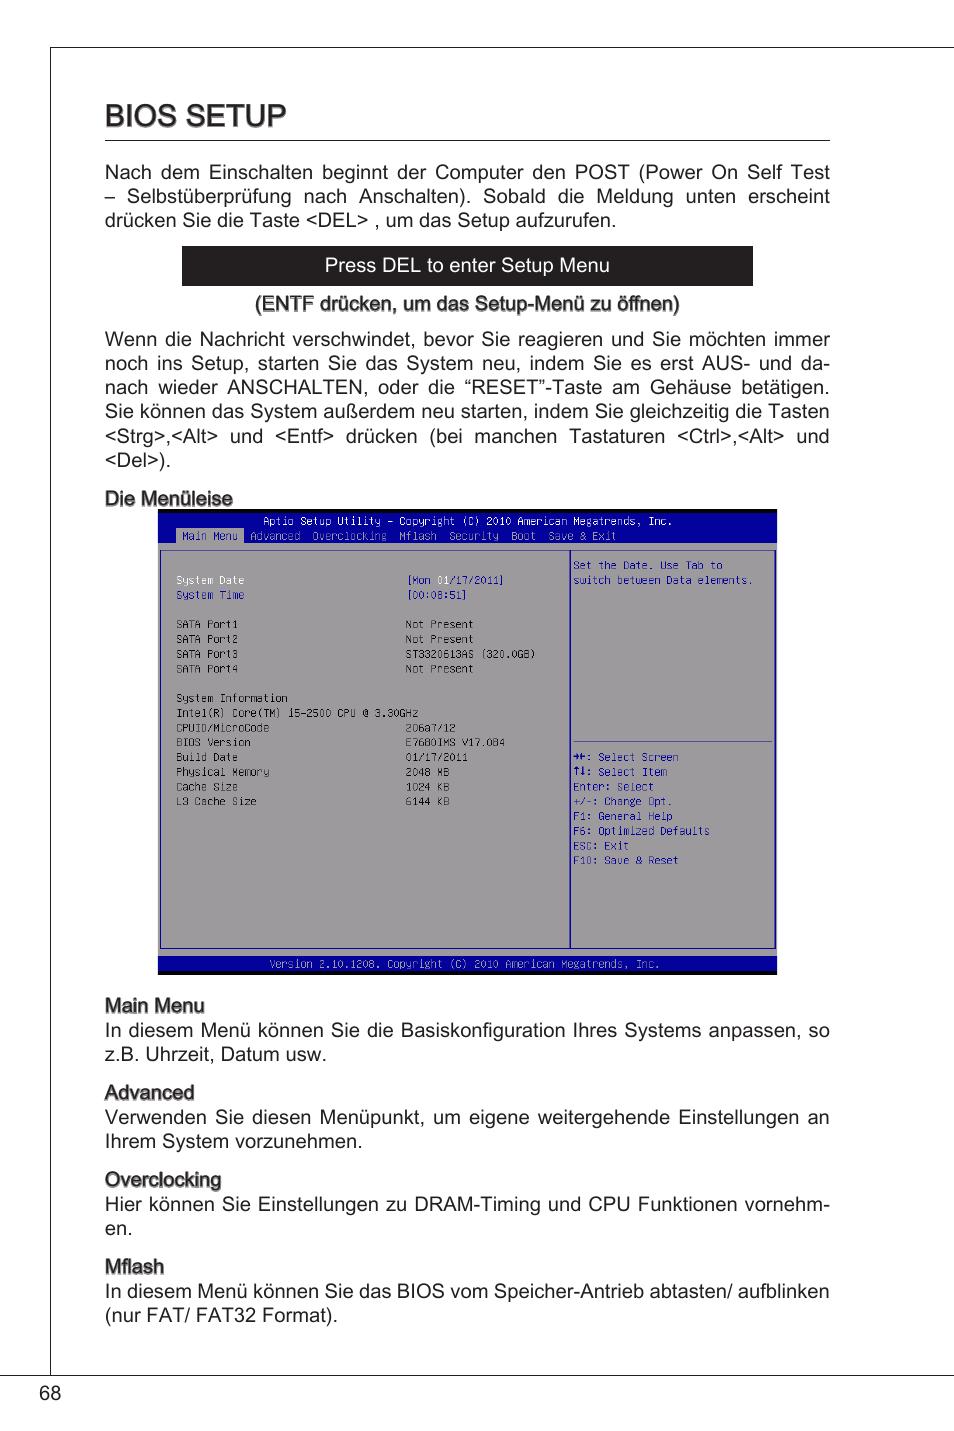 Bios setup | MSI H61M-P21 (B3) User Manual | Page 68 / 137